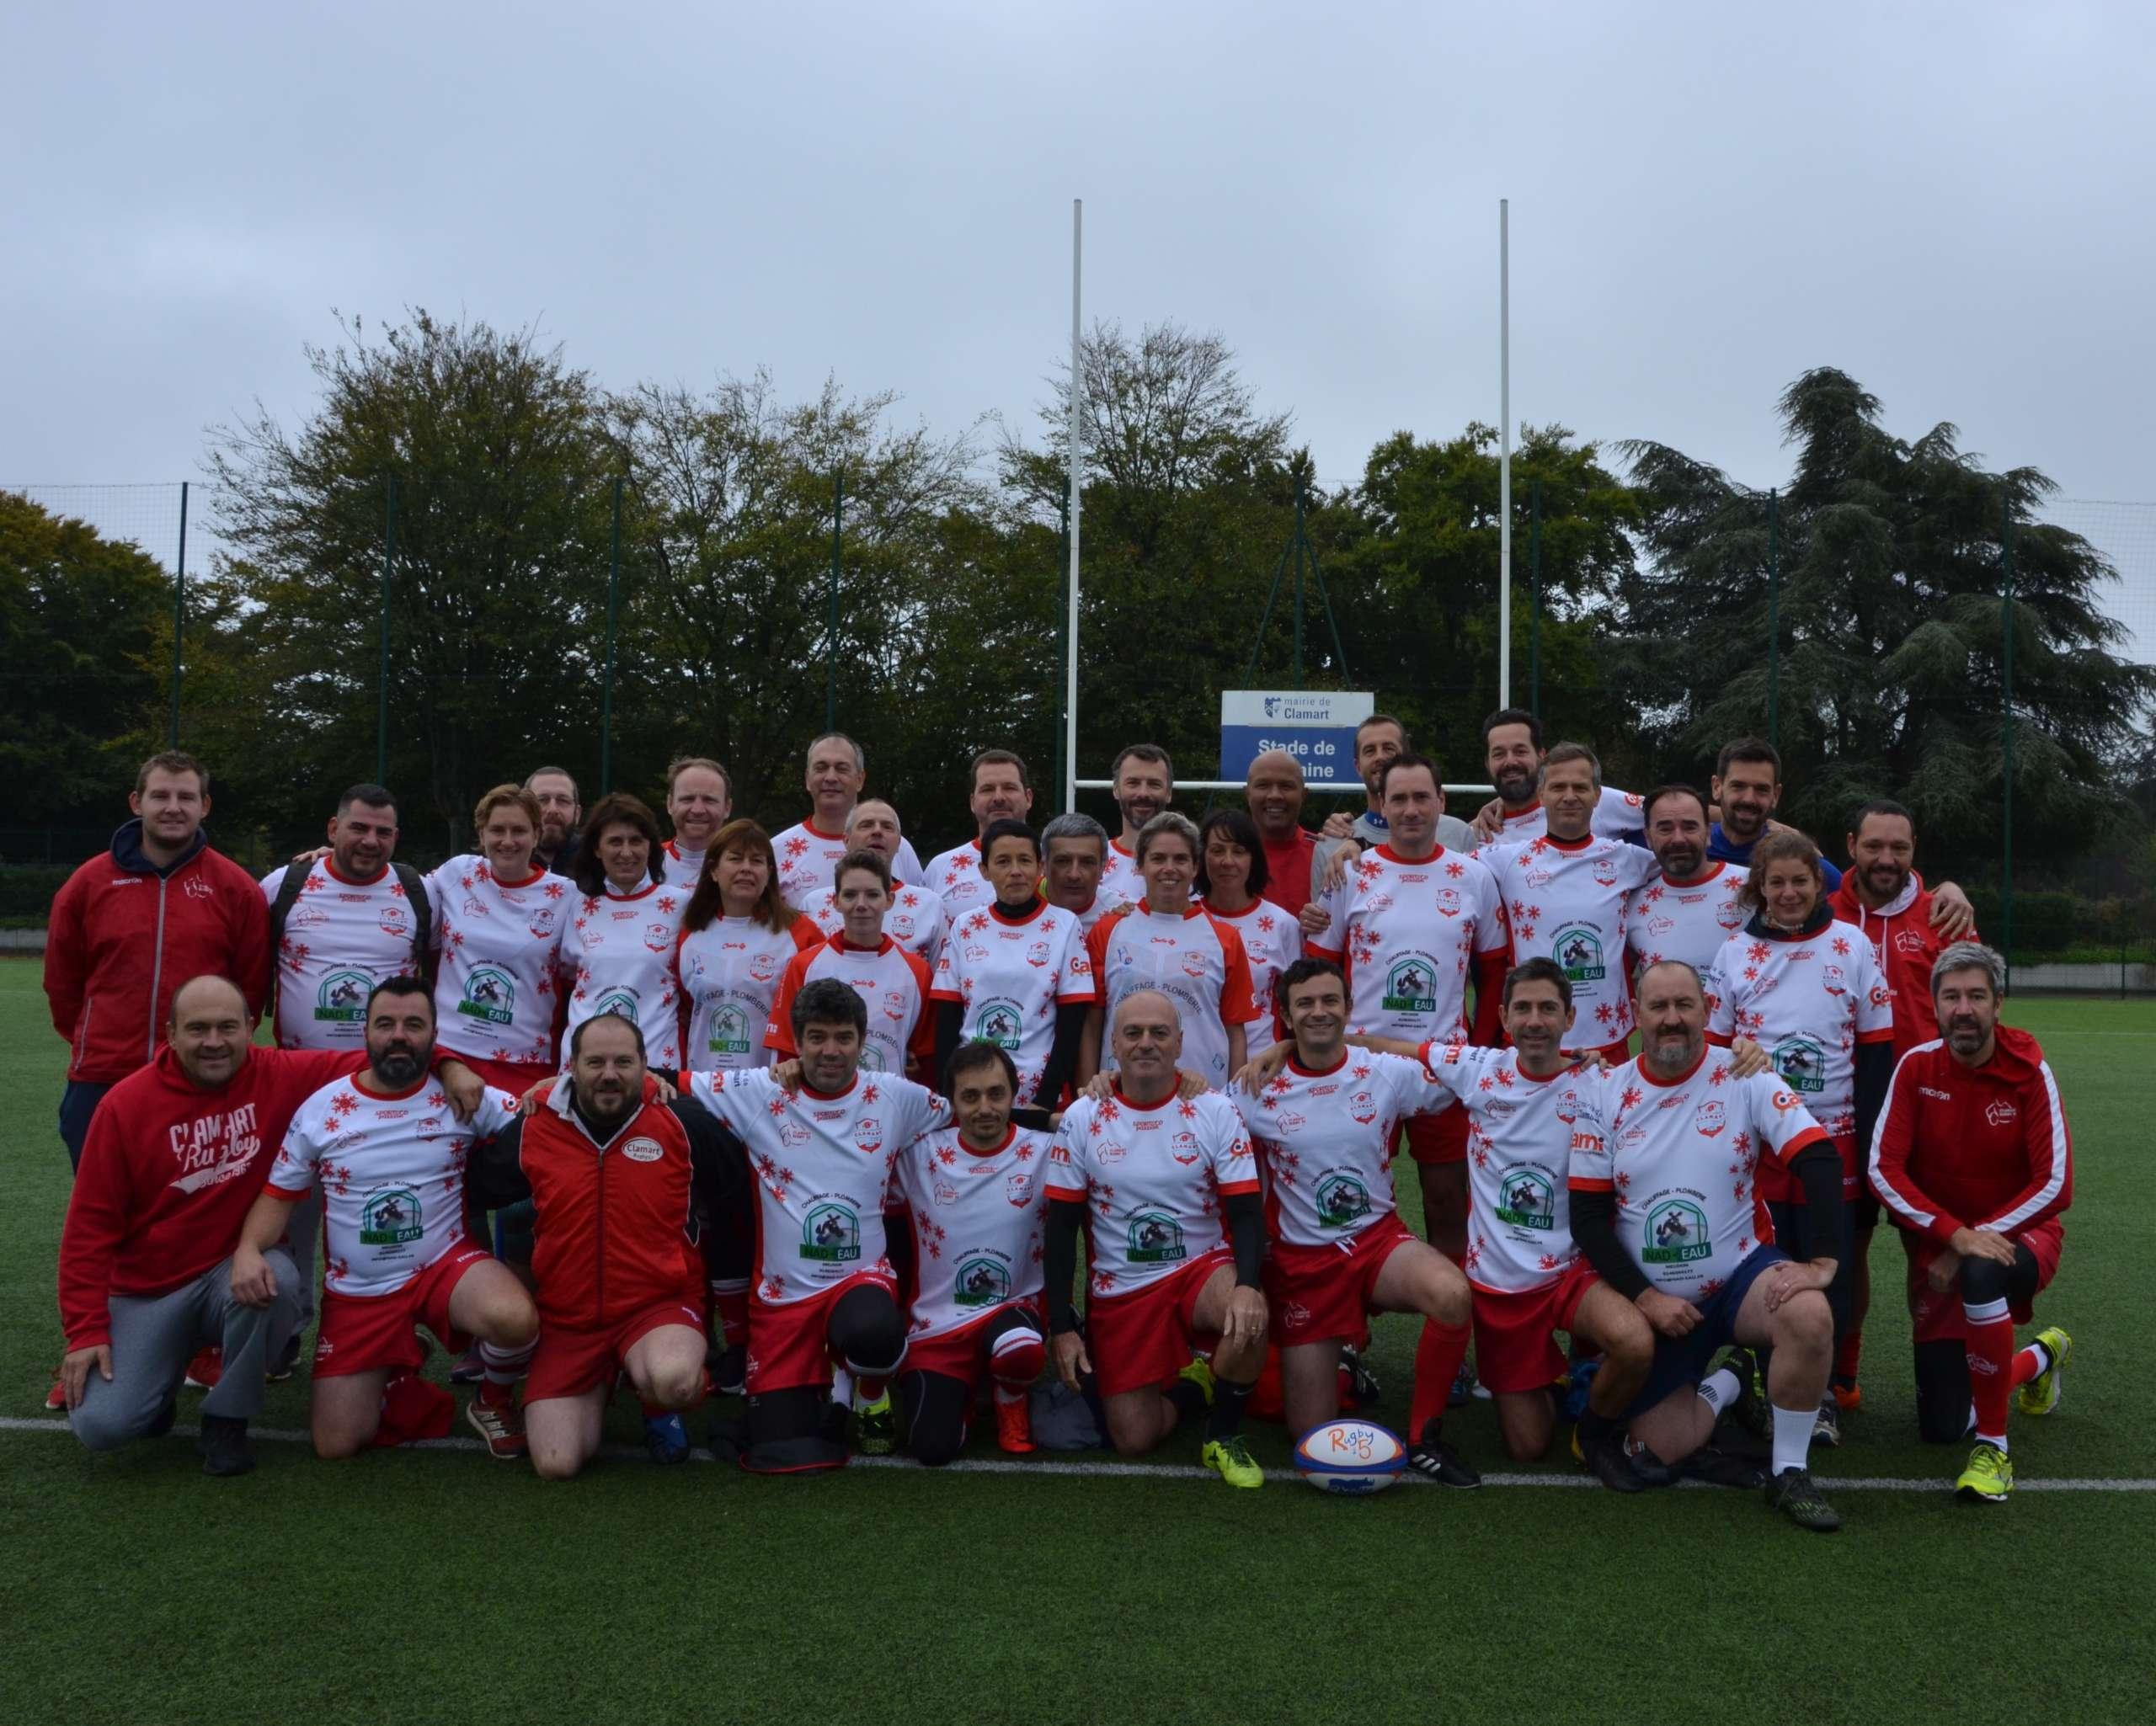 Clamart Rugby 92 Equipe Ice team Rugby à 5